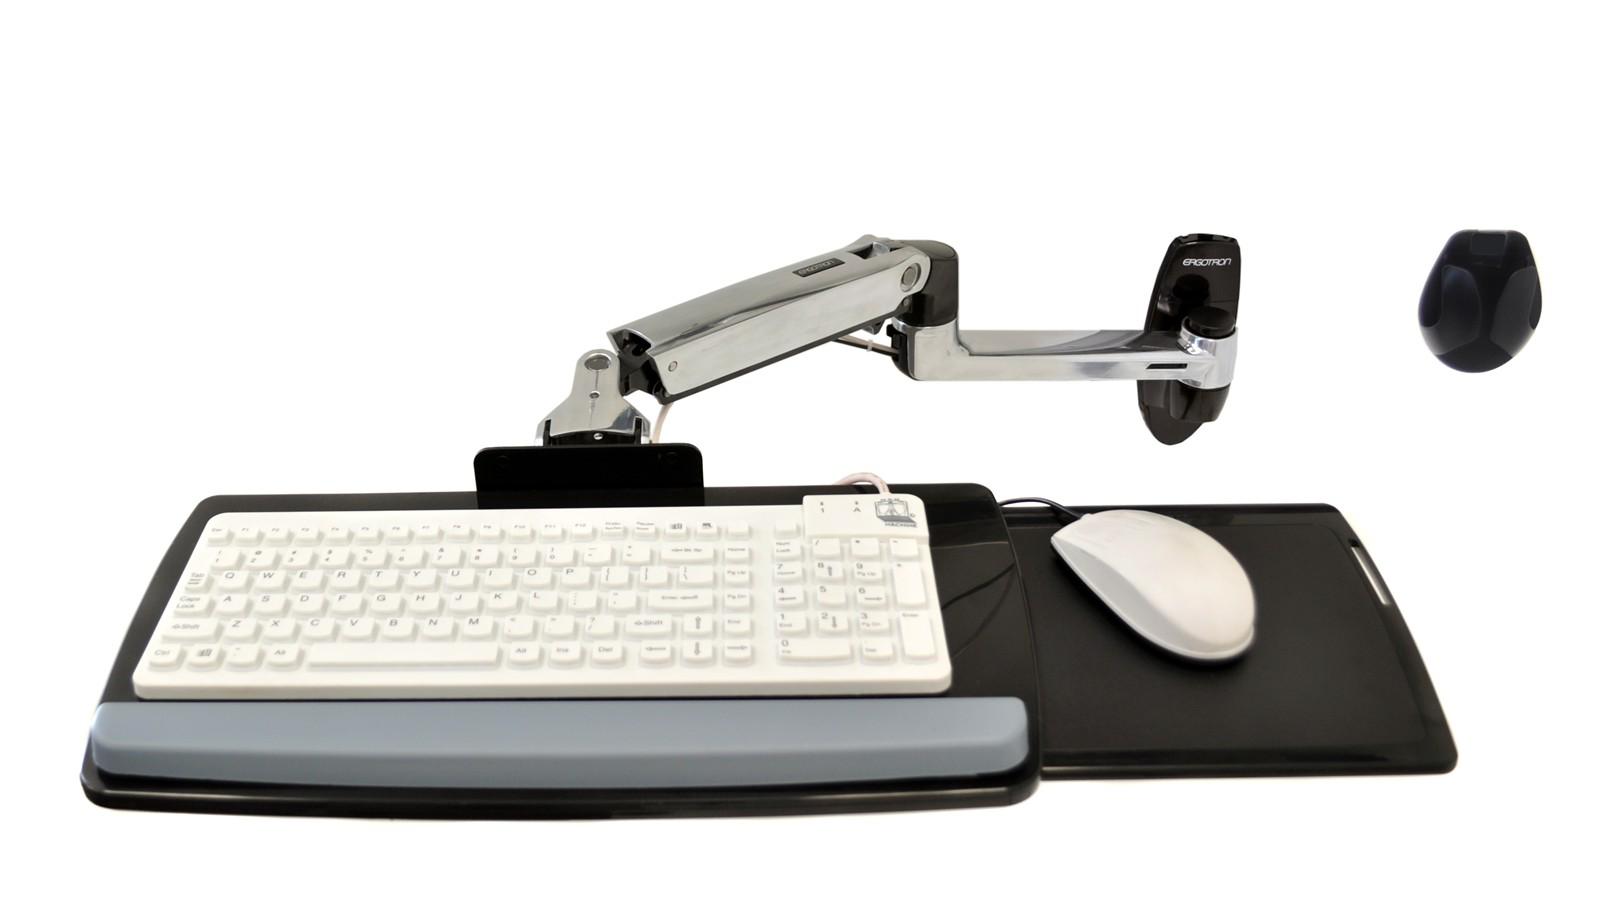 LX ウォールマウントキーボードアーム 45-246-026